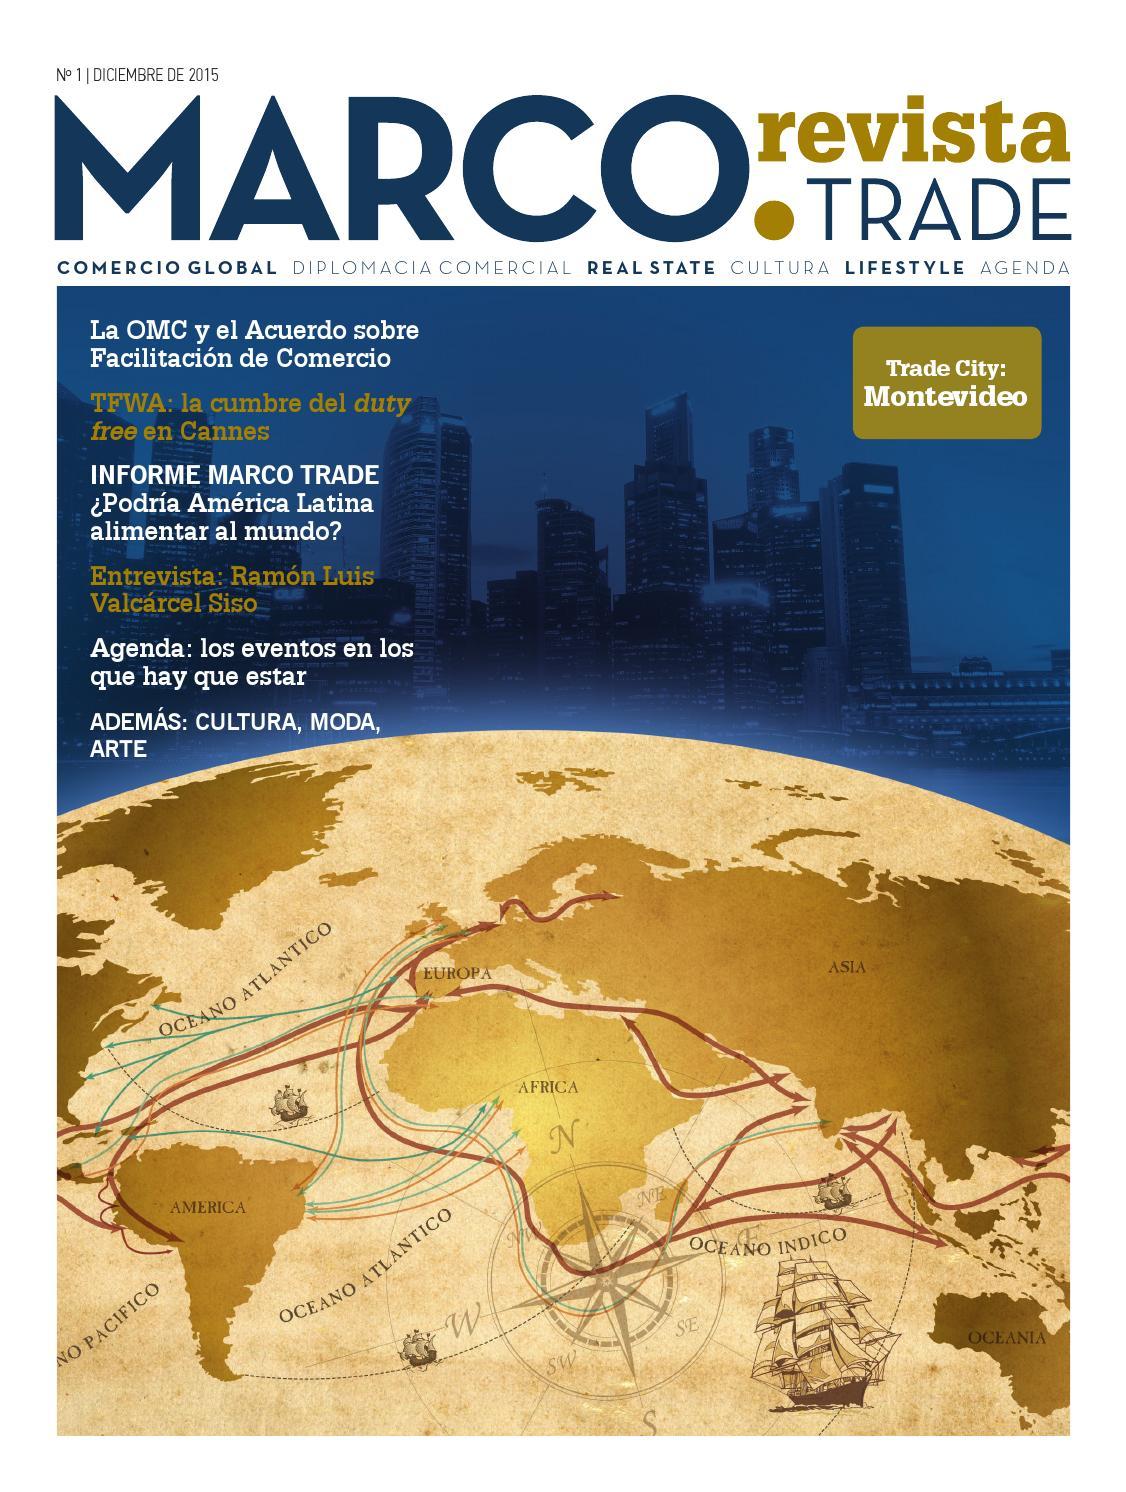 MARCO TRADE REVISTA by MARCO TRADE REVISTA - issuu